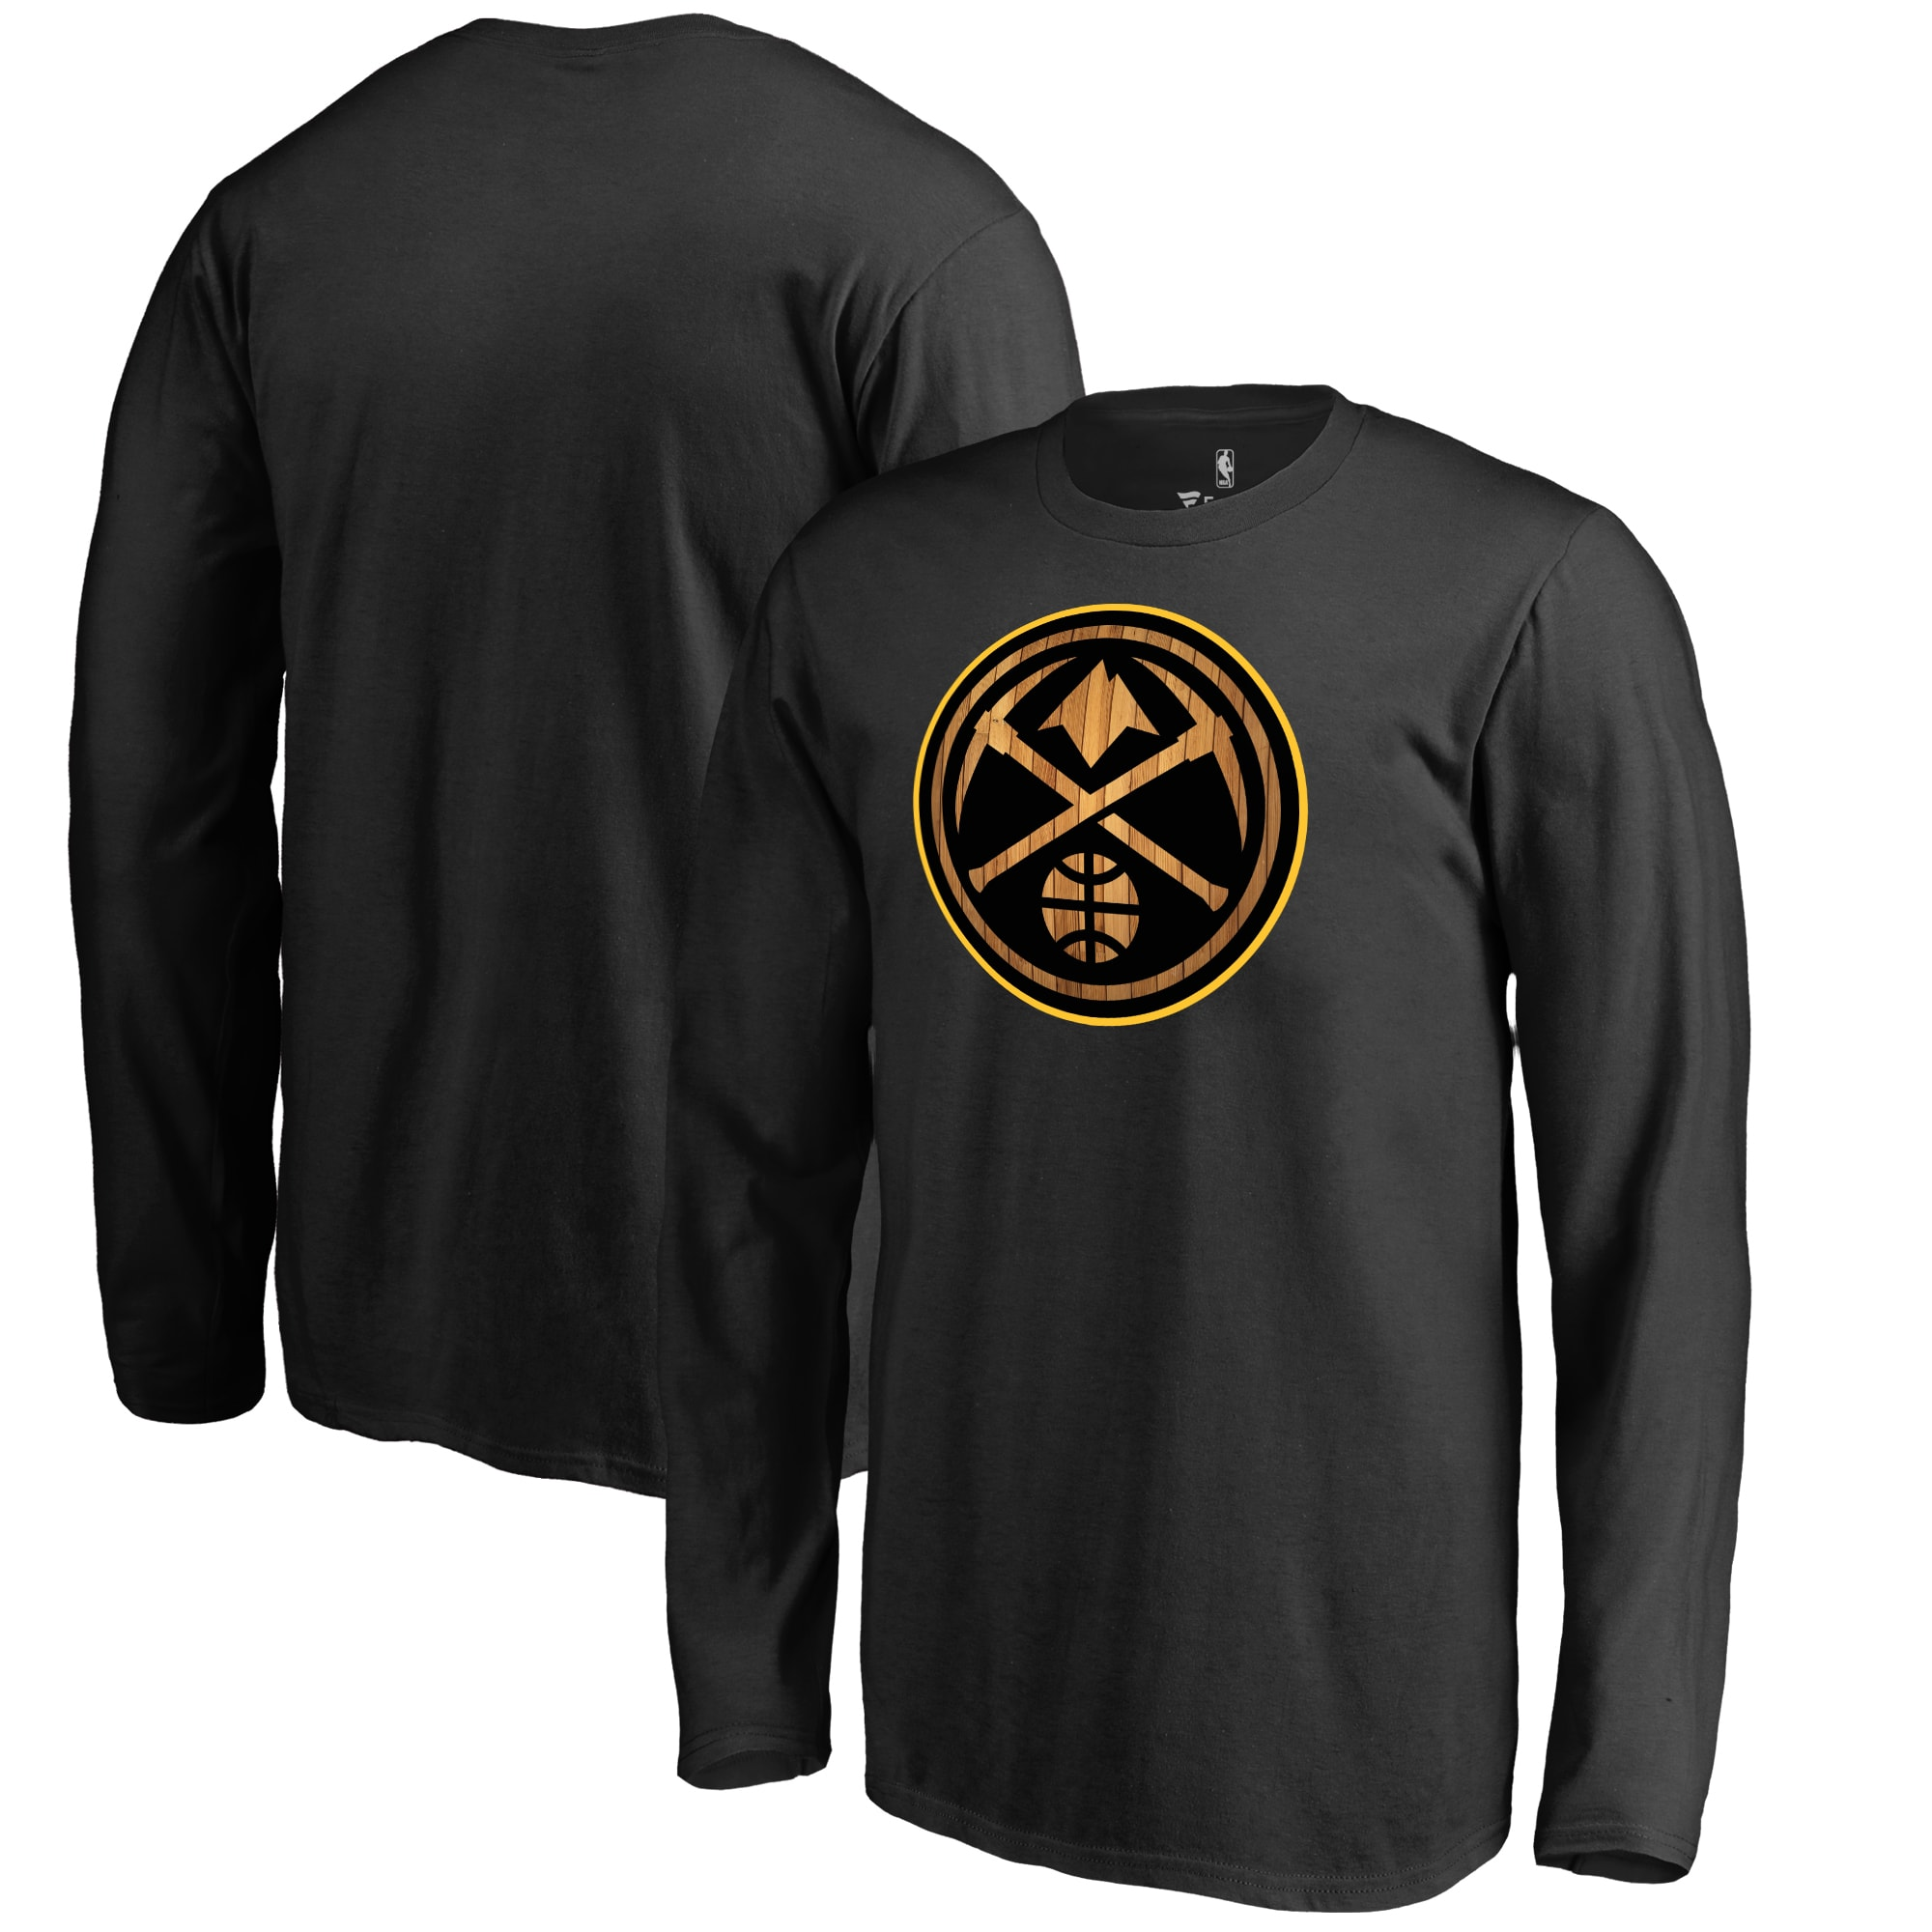 Denver Nuggets Fanatics Branded Youth Hardwood Long Sleeve T-Shirt - Black